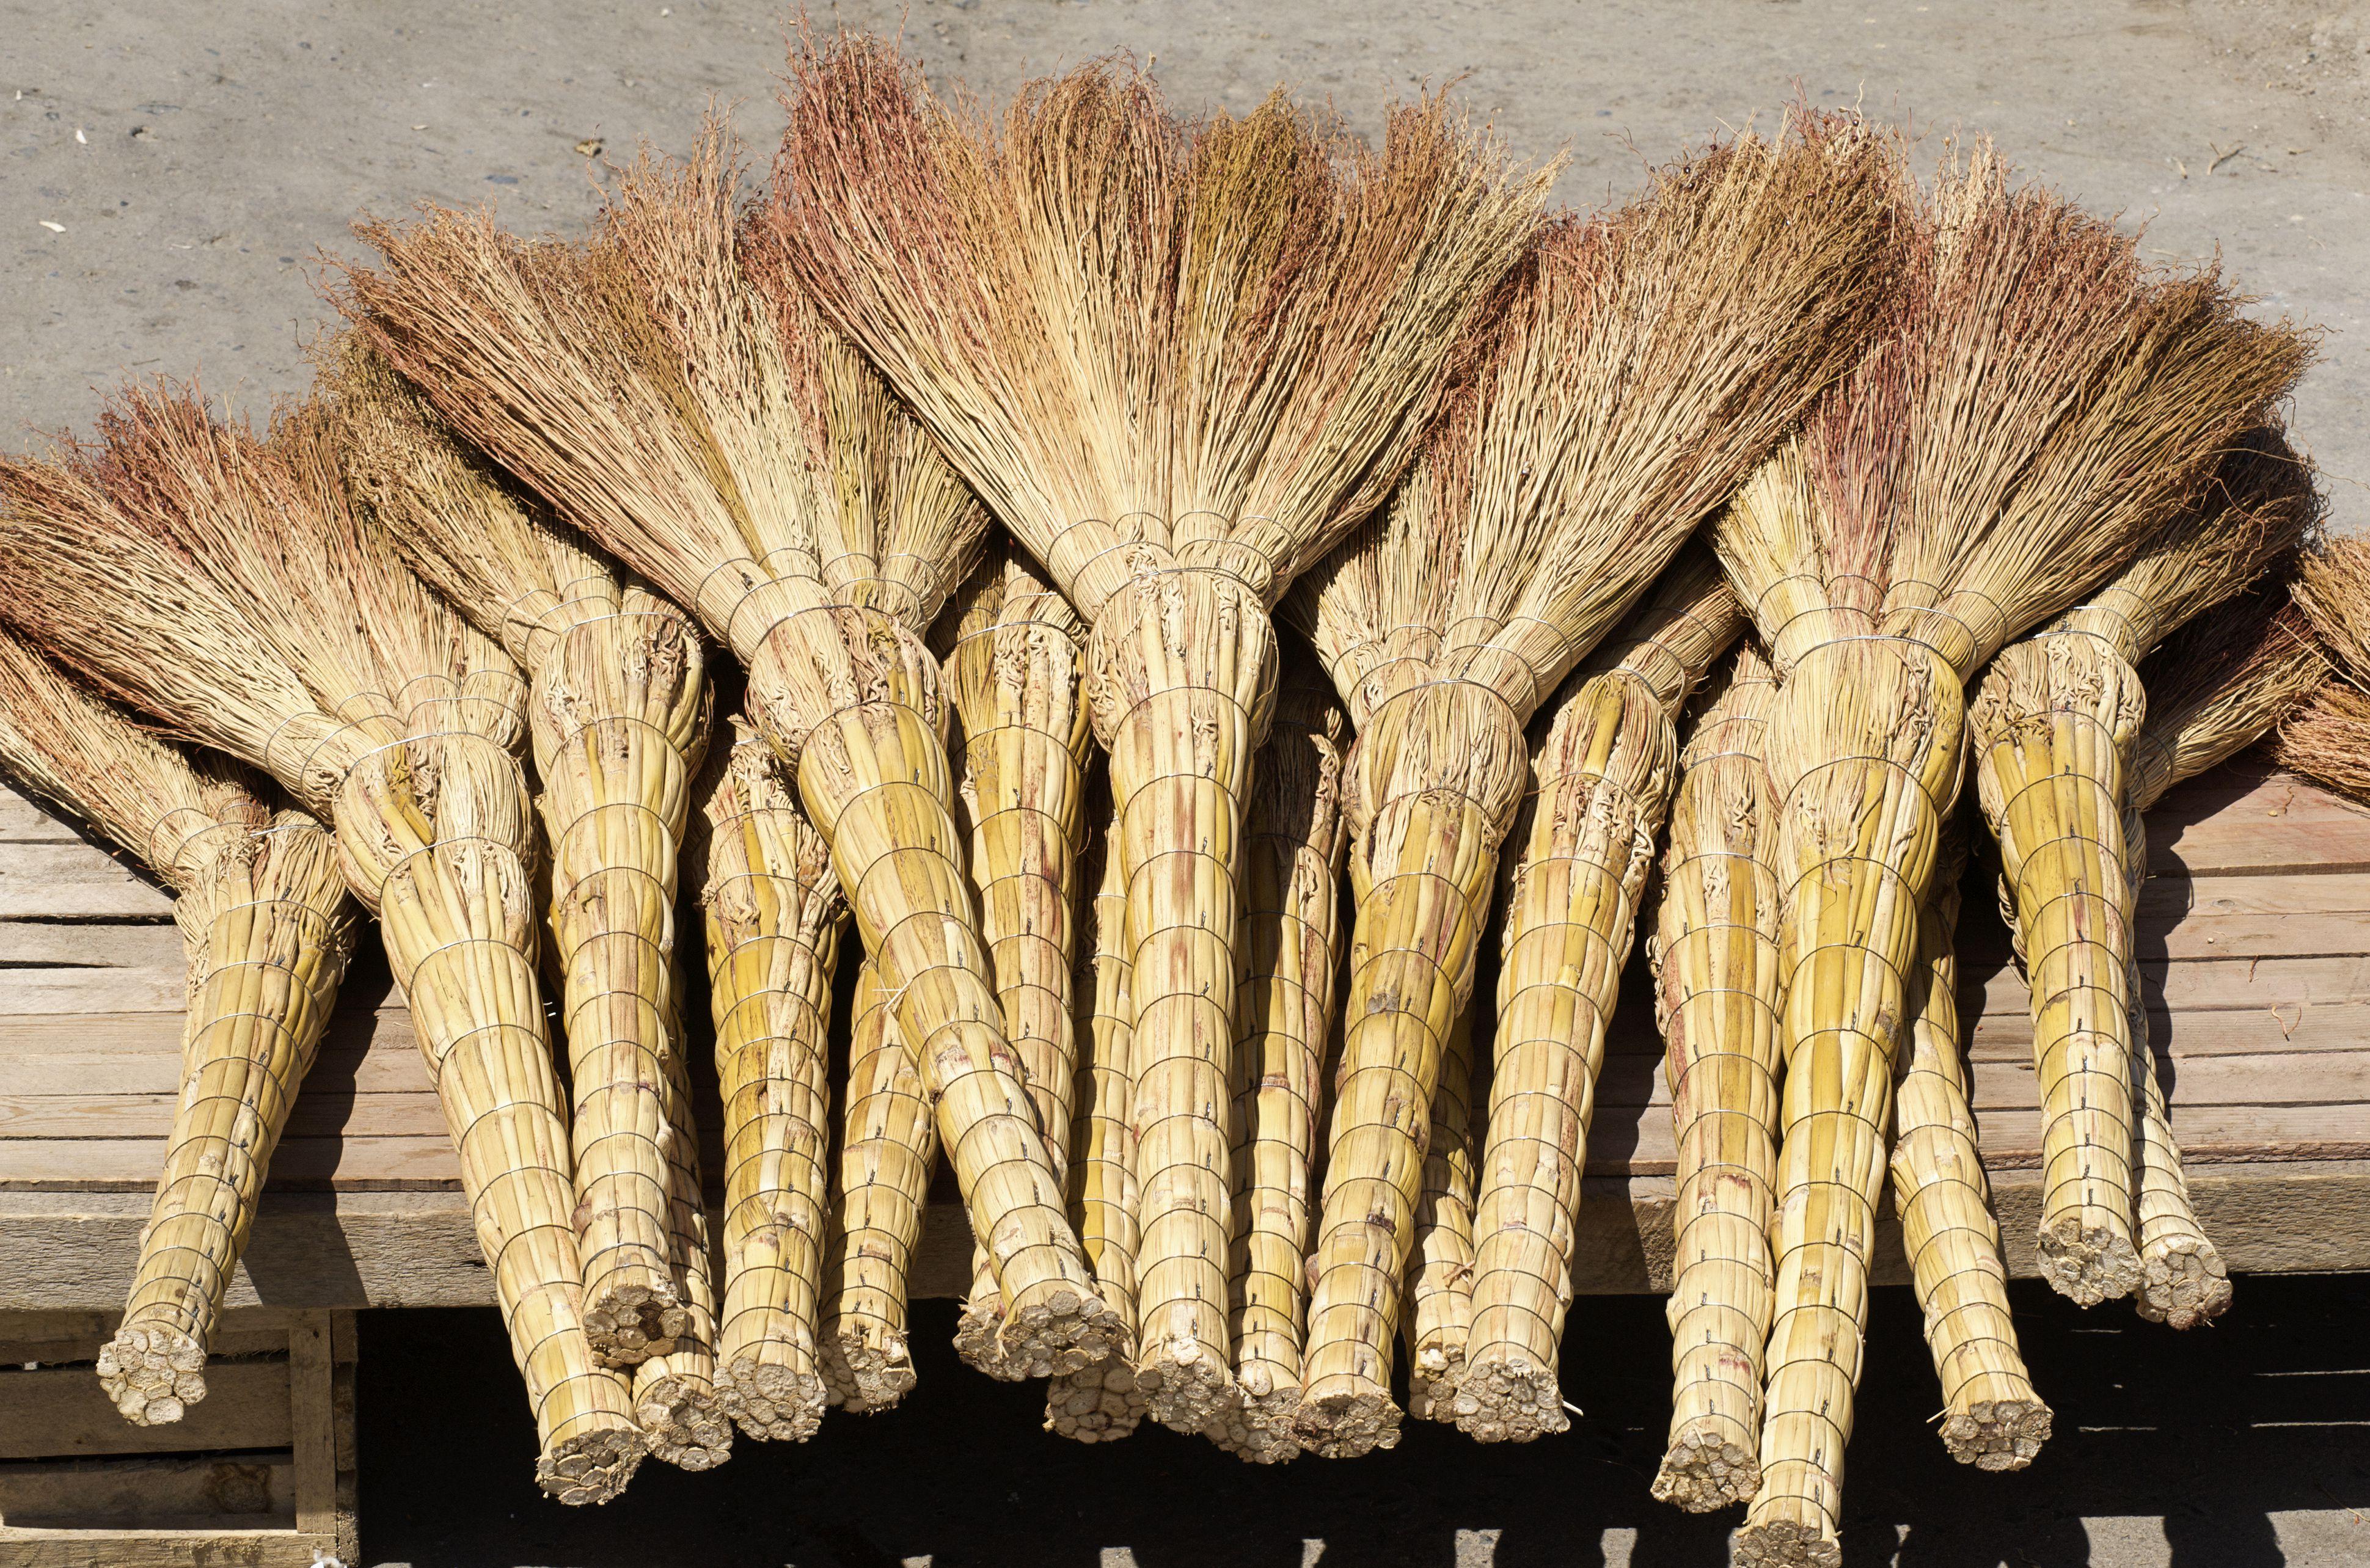 Handmade brooms at market, Samarkand, Uzbekistan